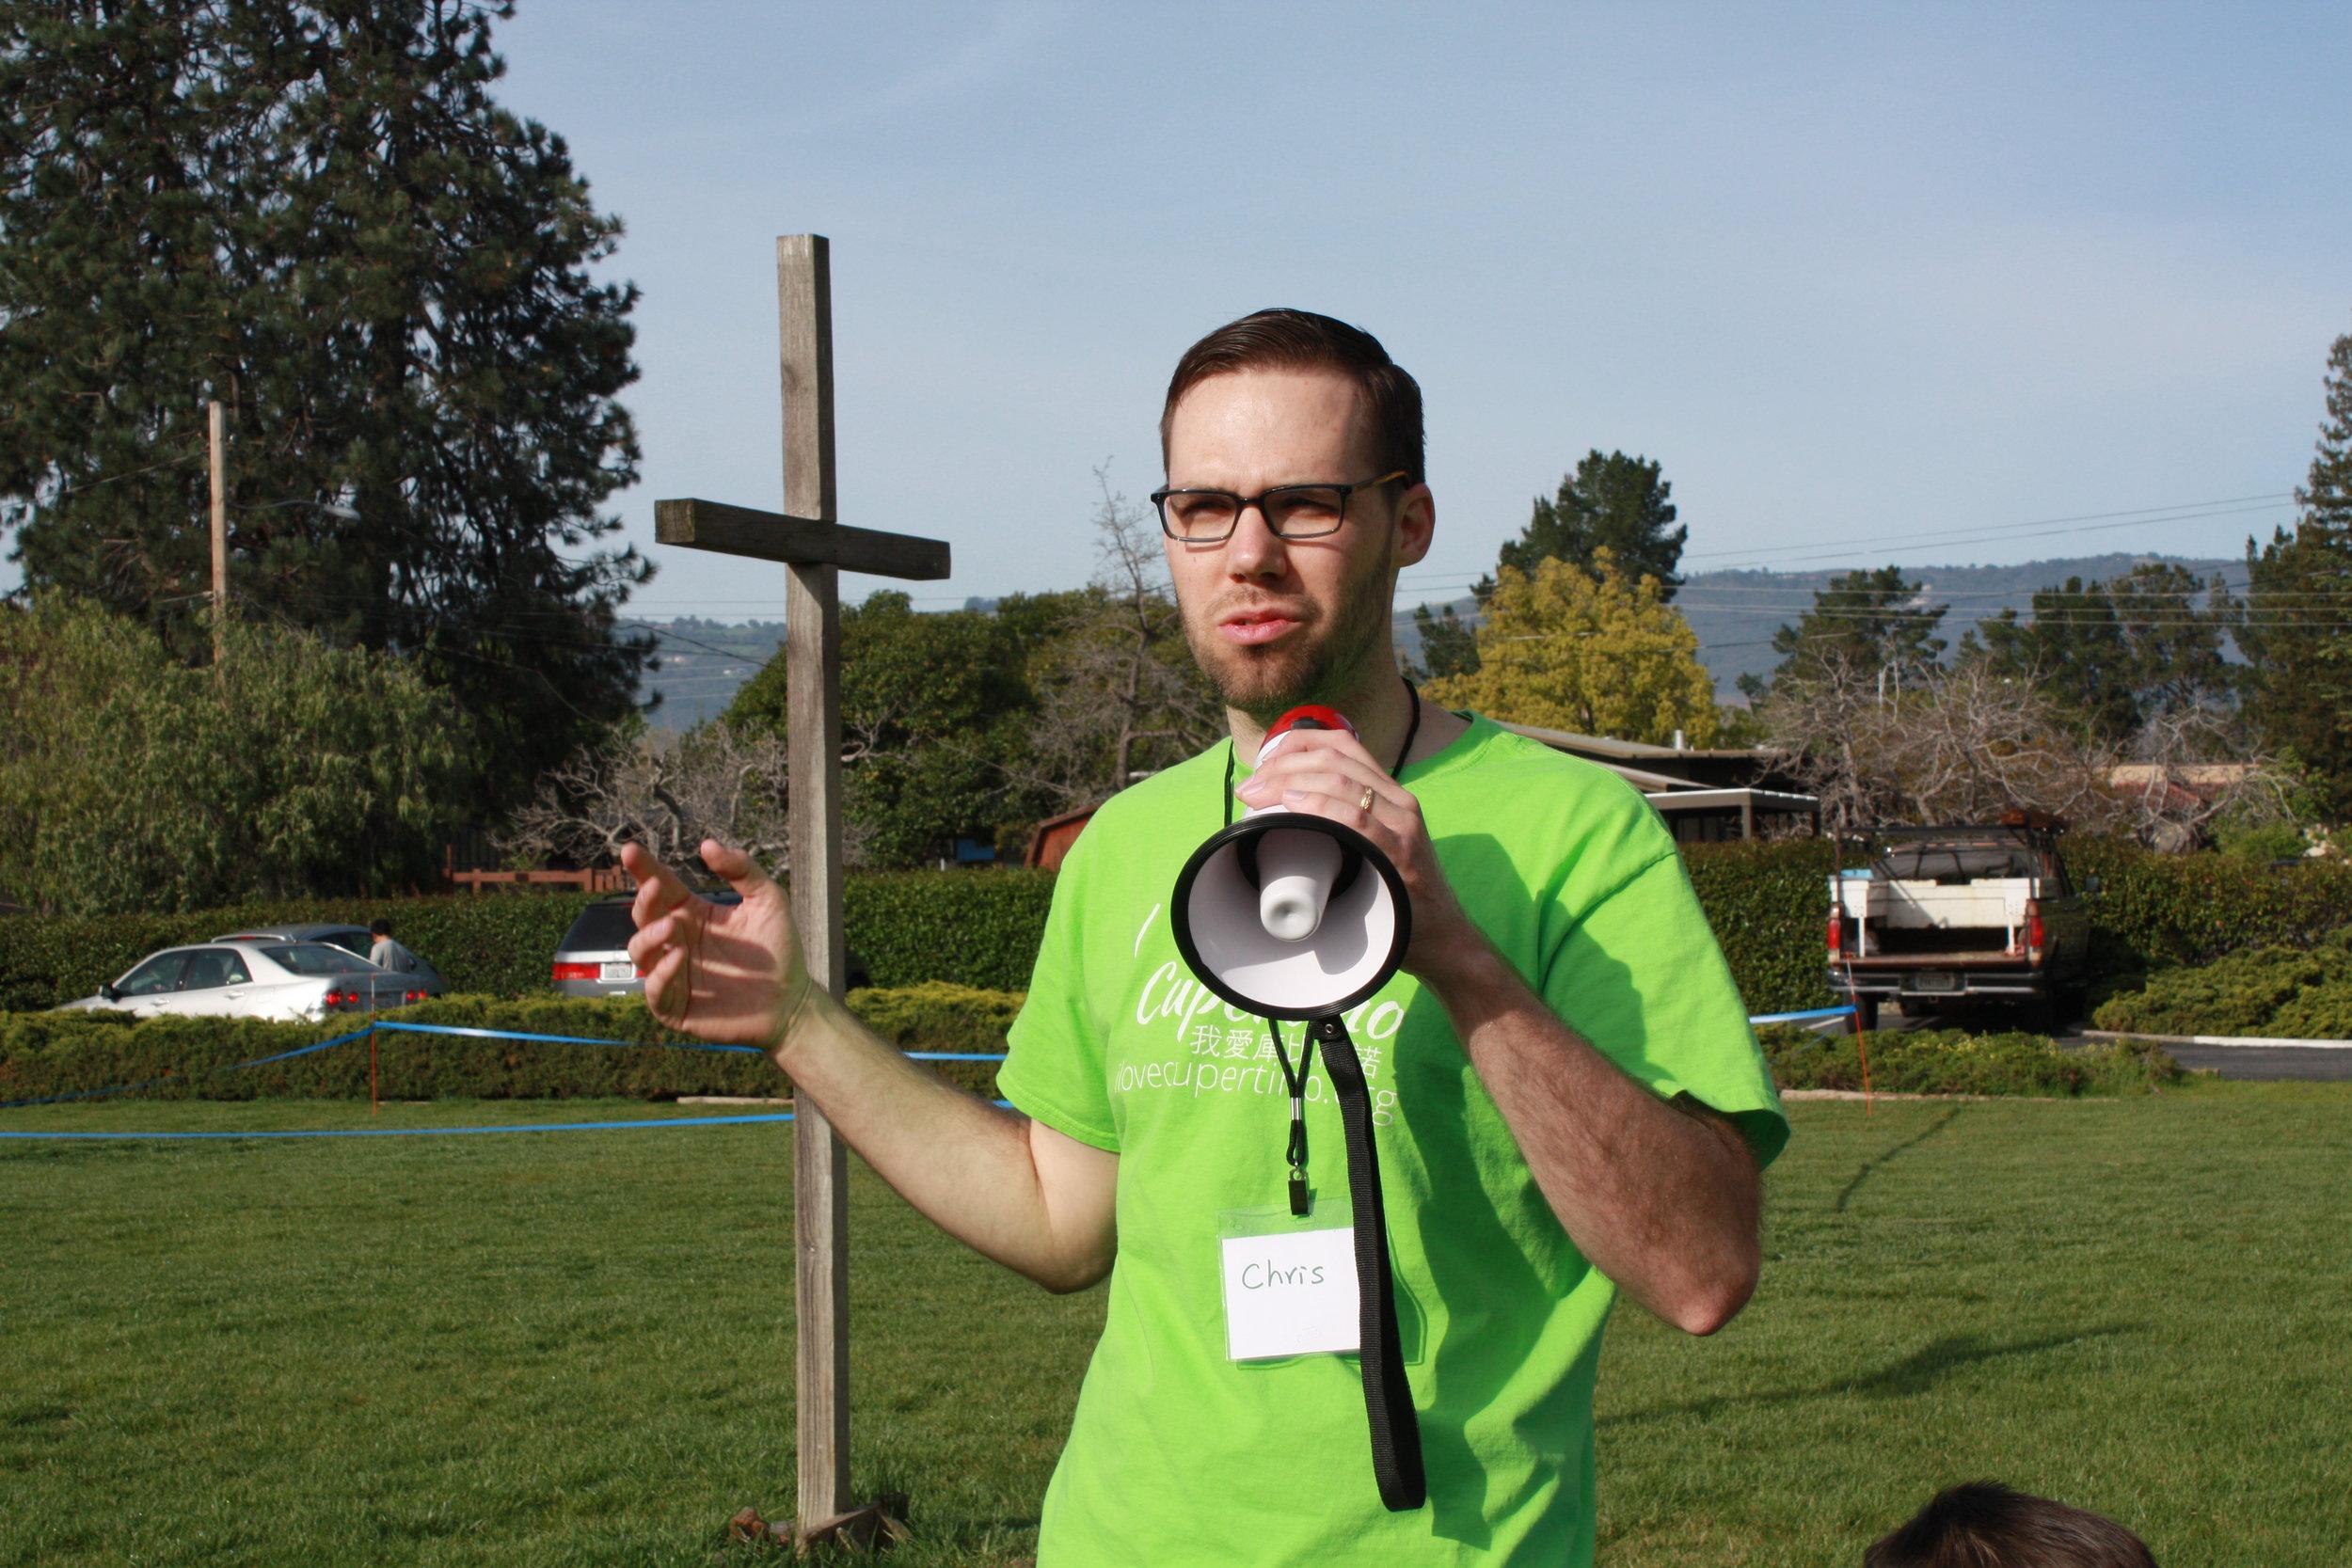 Pastor Chris welcoming guests